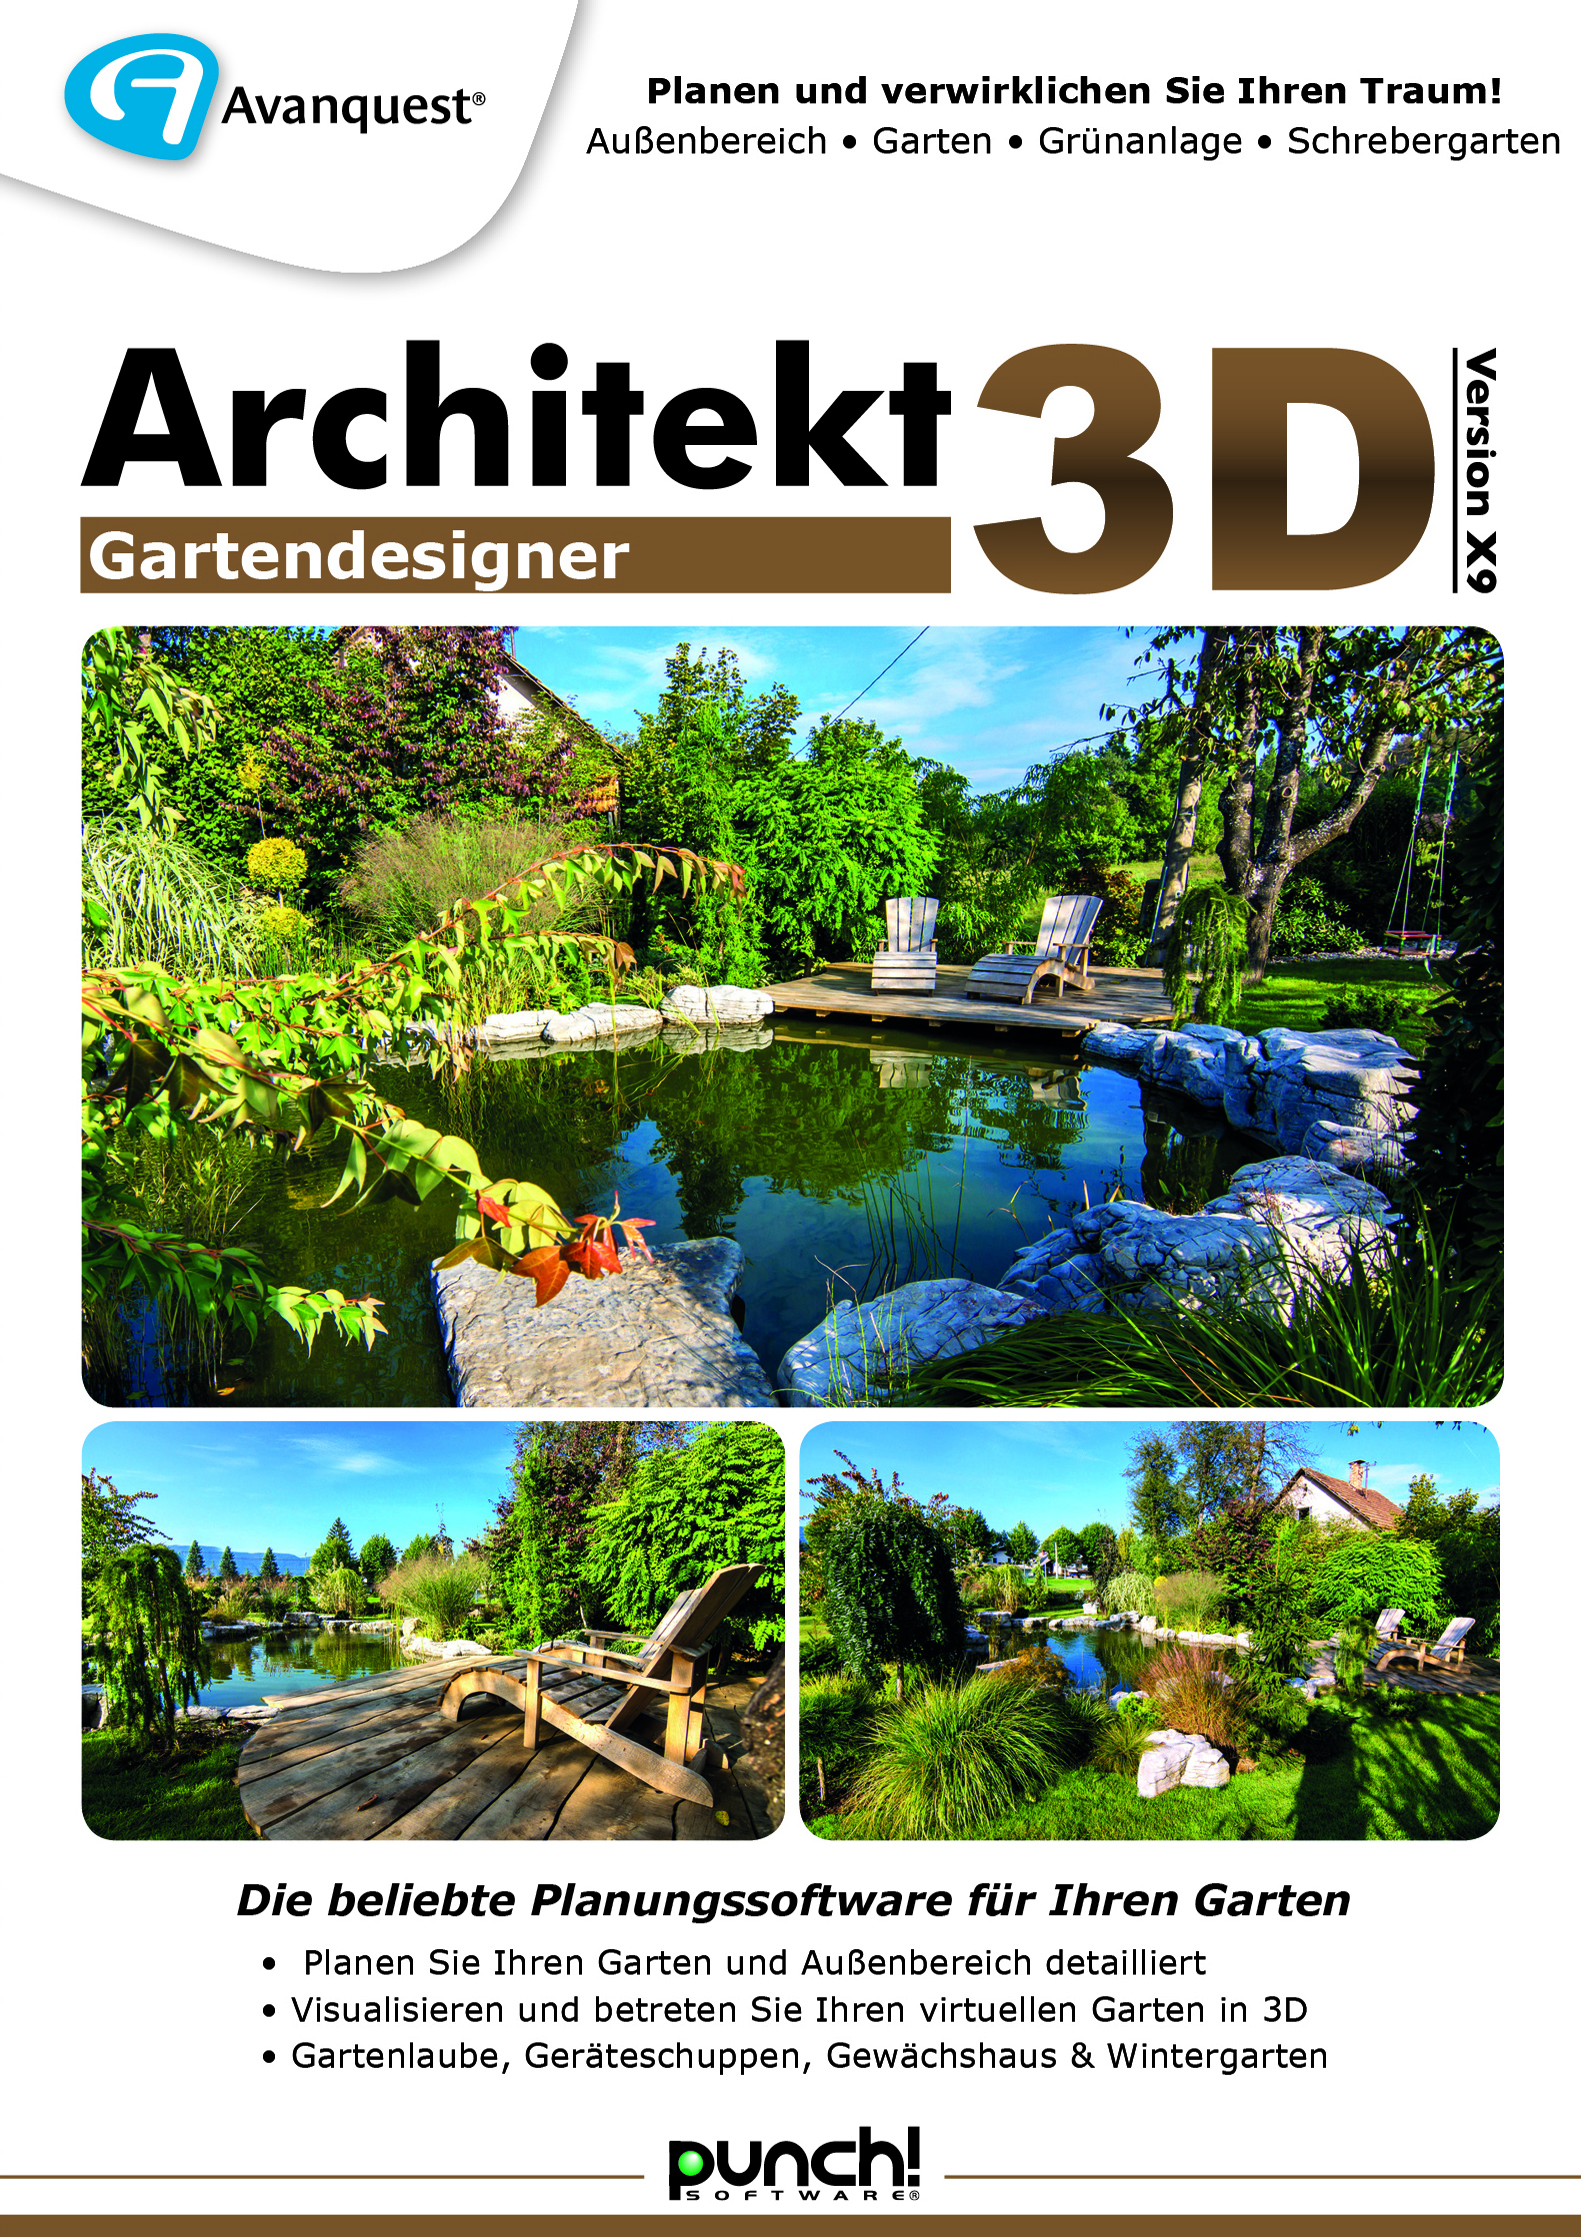 Architekt 3D Gartendesigner X9 2D 300dpi CMYK